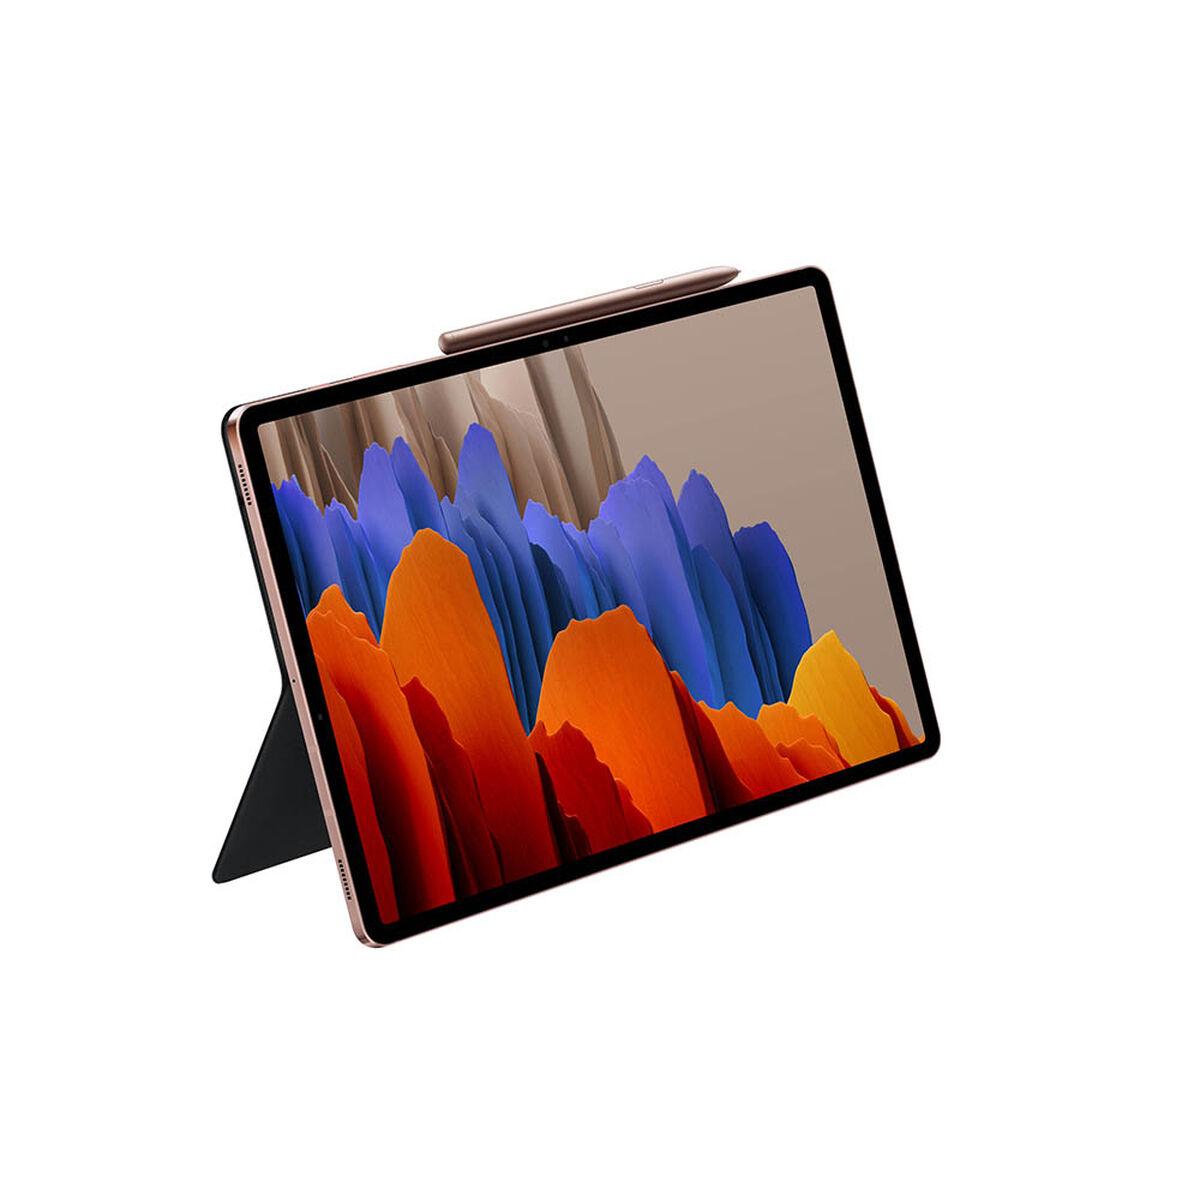 "Tablet Samsung SM-T870 Galaxy Tab S7 6GB 128GB 11"" Wifi Cobre + Keyboard + Cover + S-Pen"